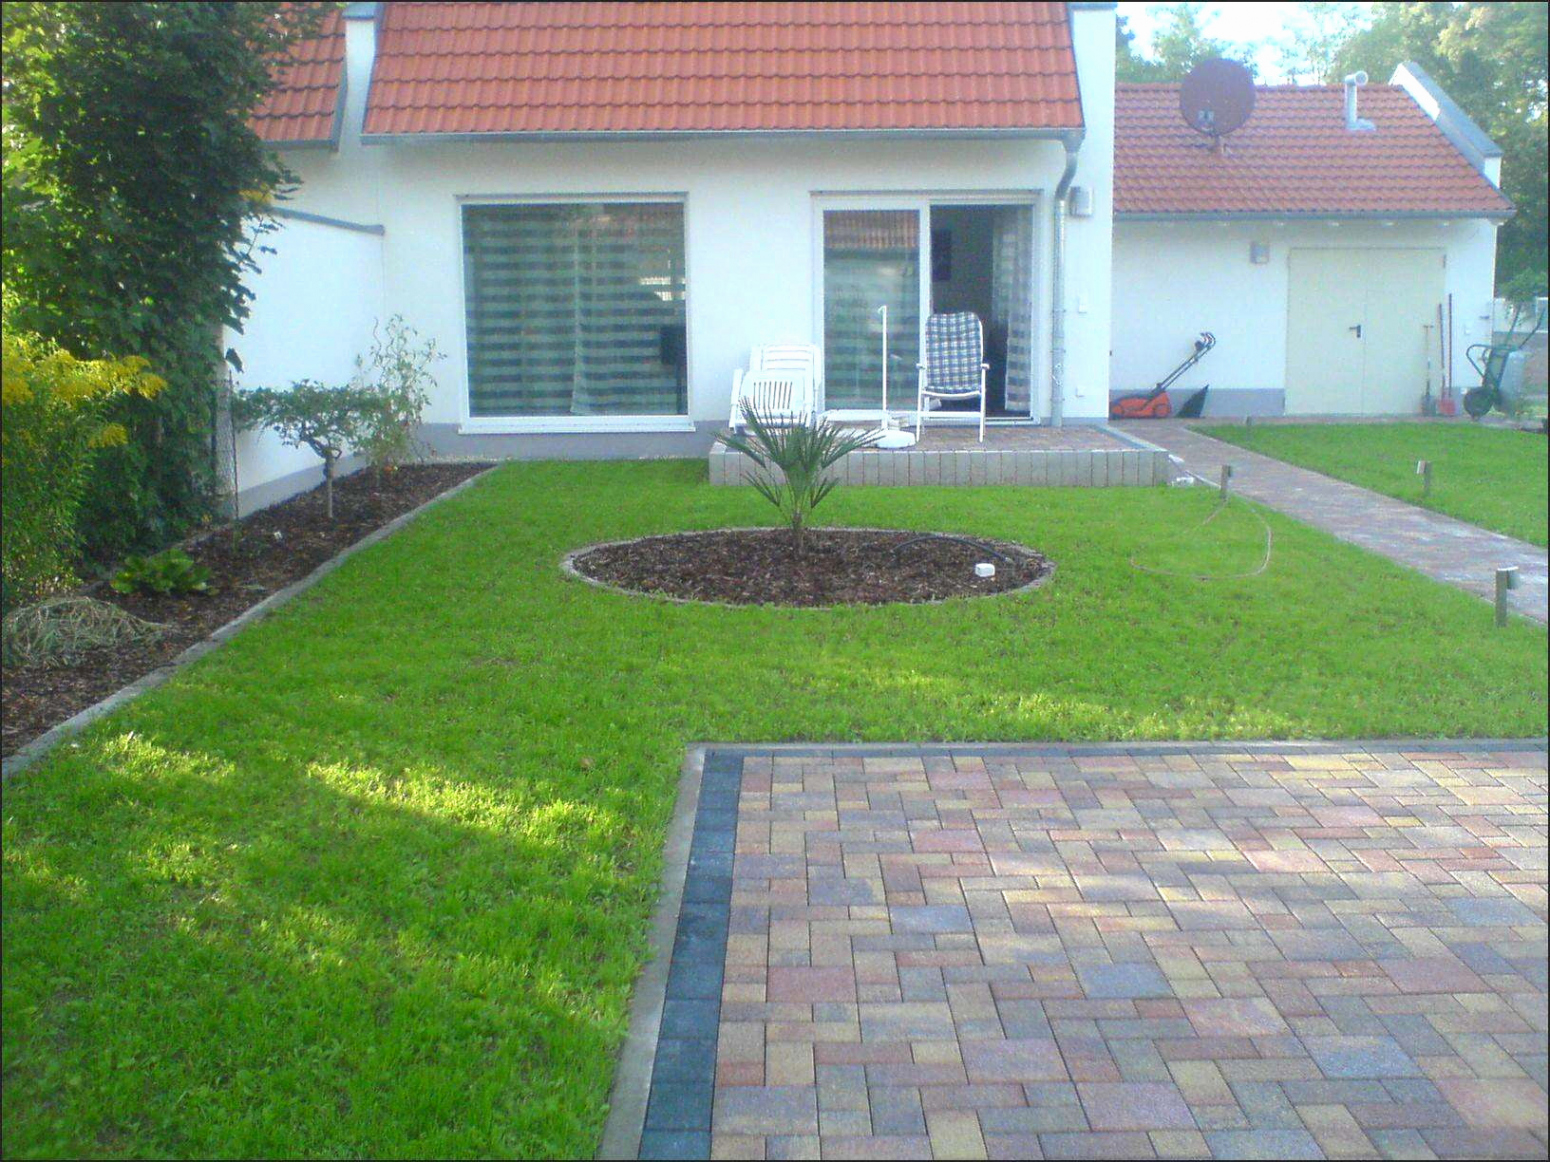 Alten Garten Neu Gestalten Elegant Alten Garten Neu Anlegen — Temobardz Home Blog